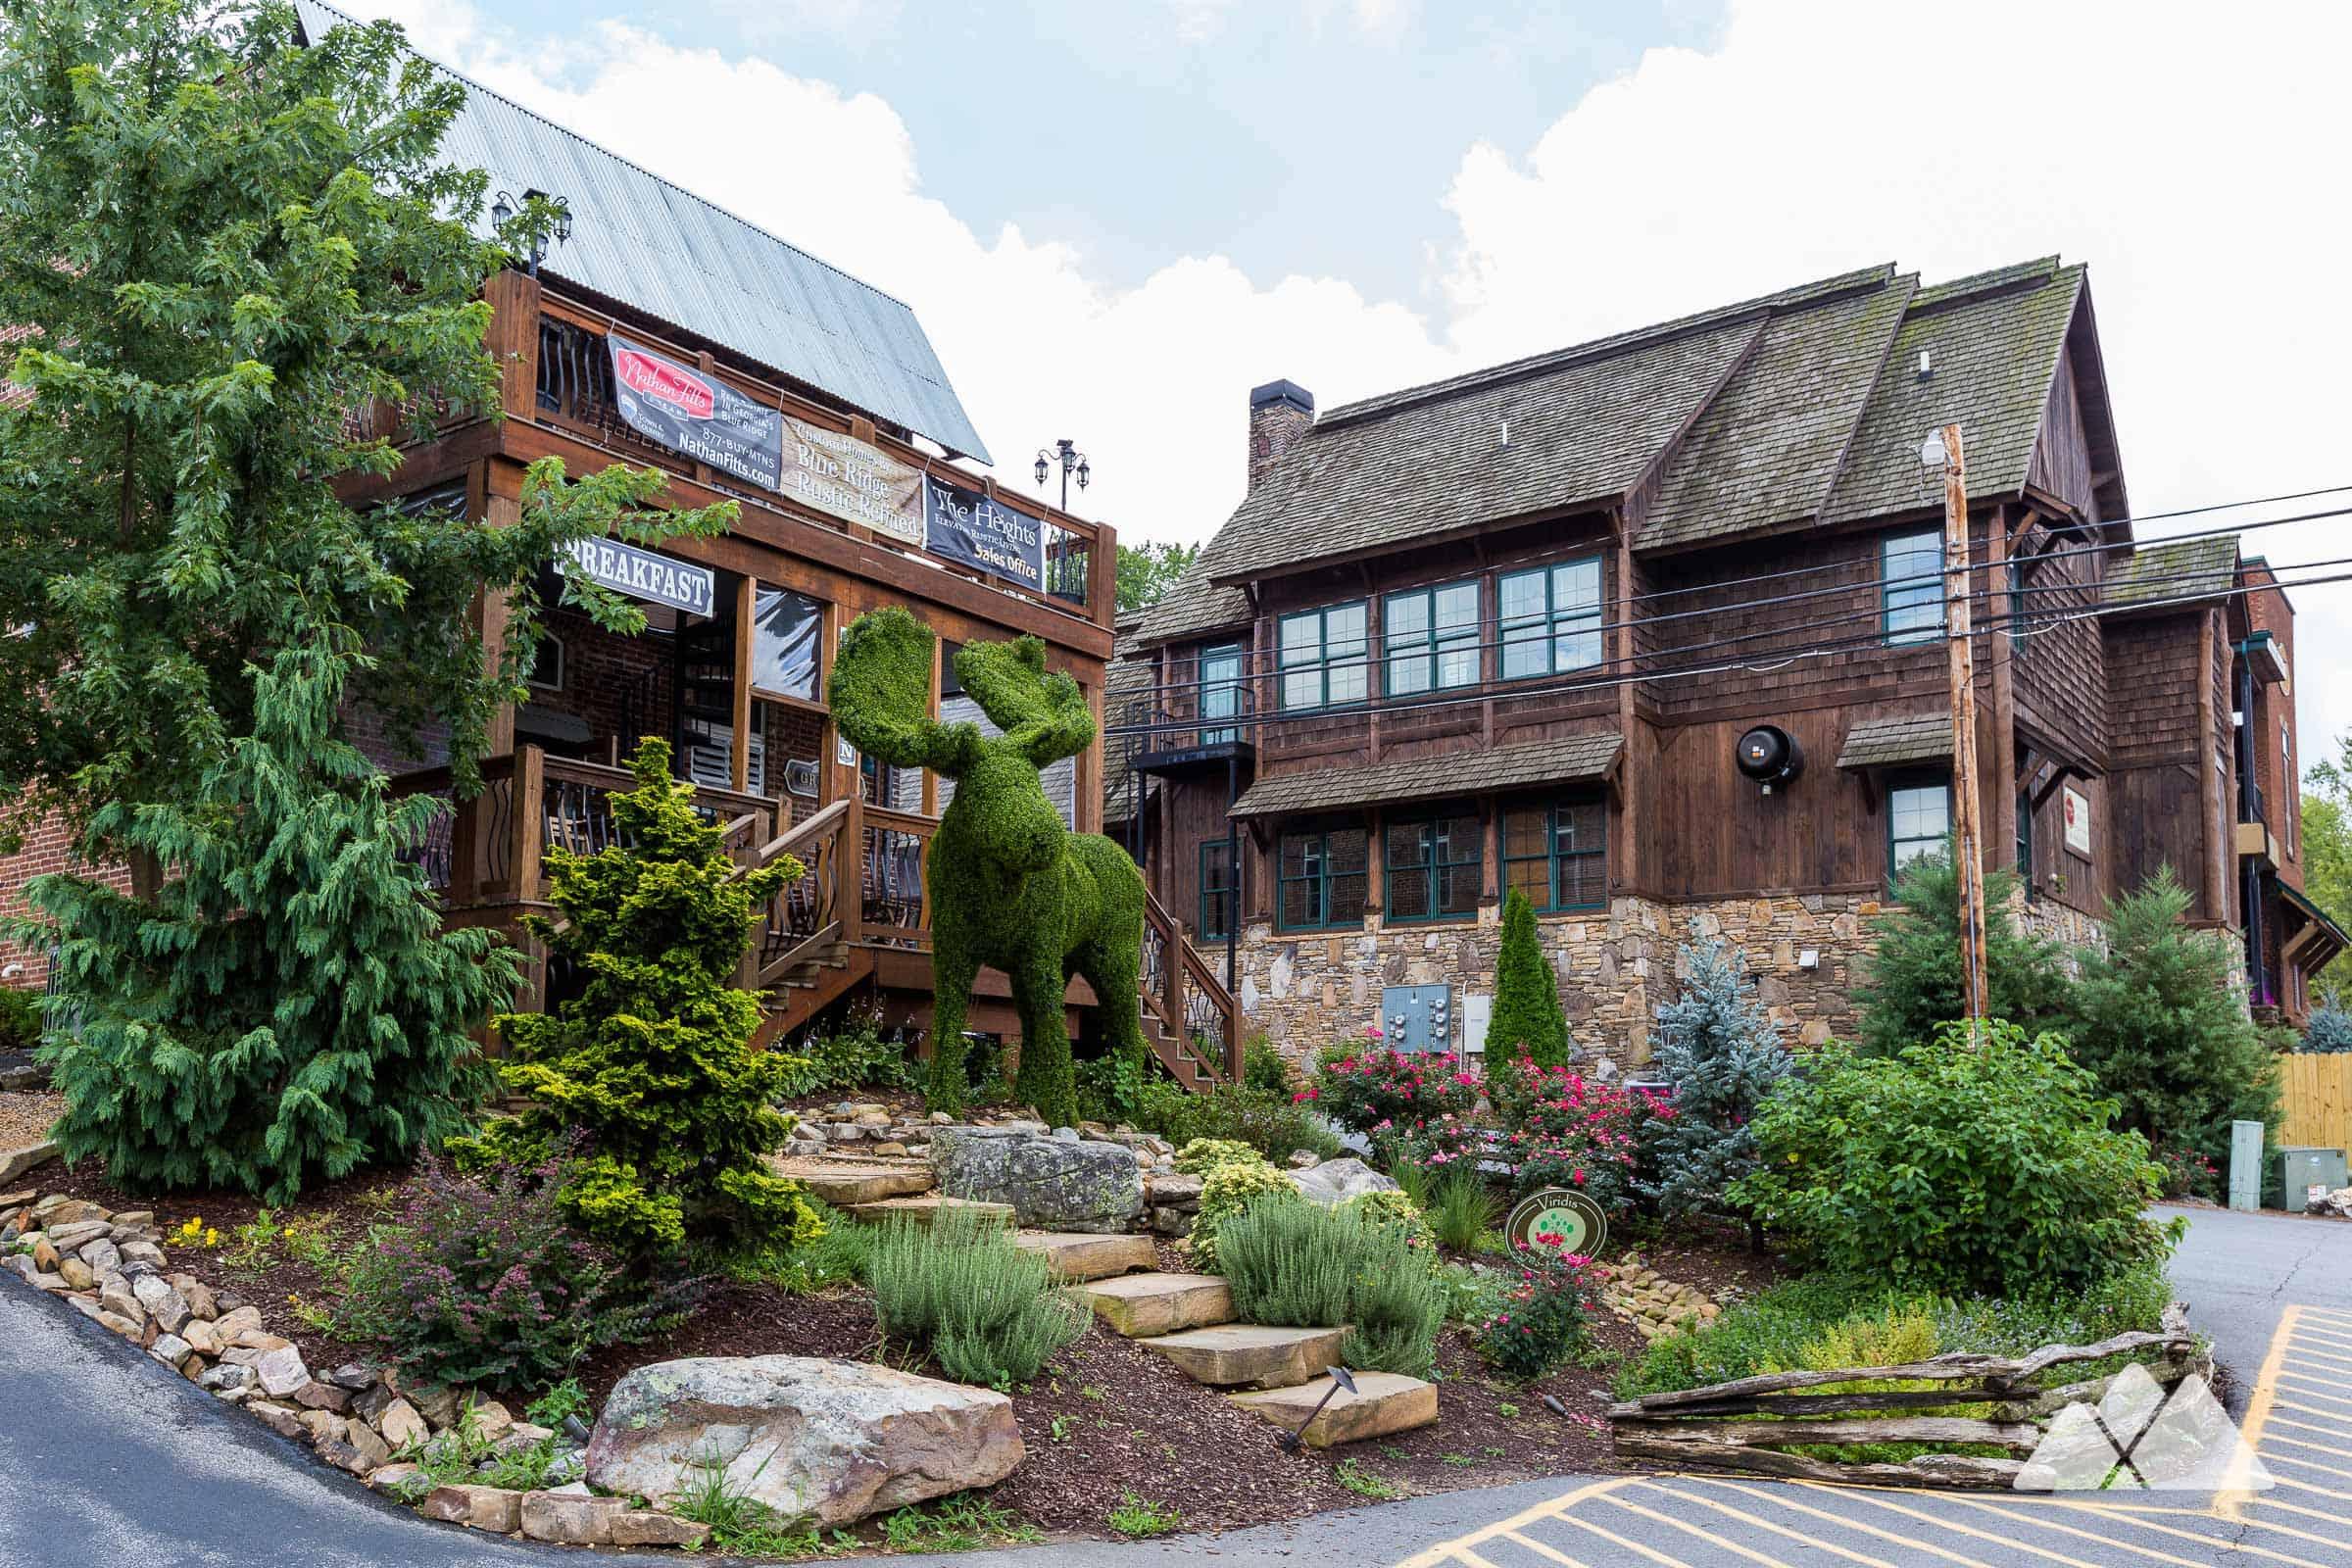 Top Outdoor Things To Do In Blue Ridge Ga Hiking Cabins